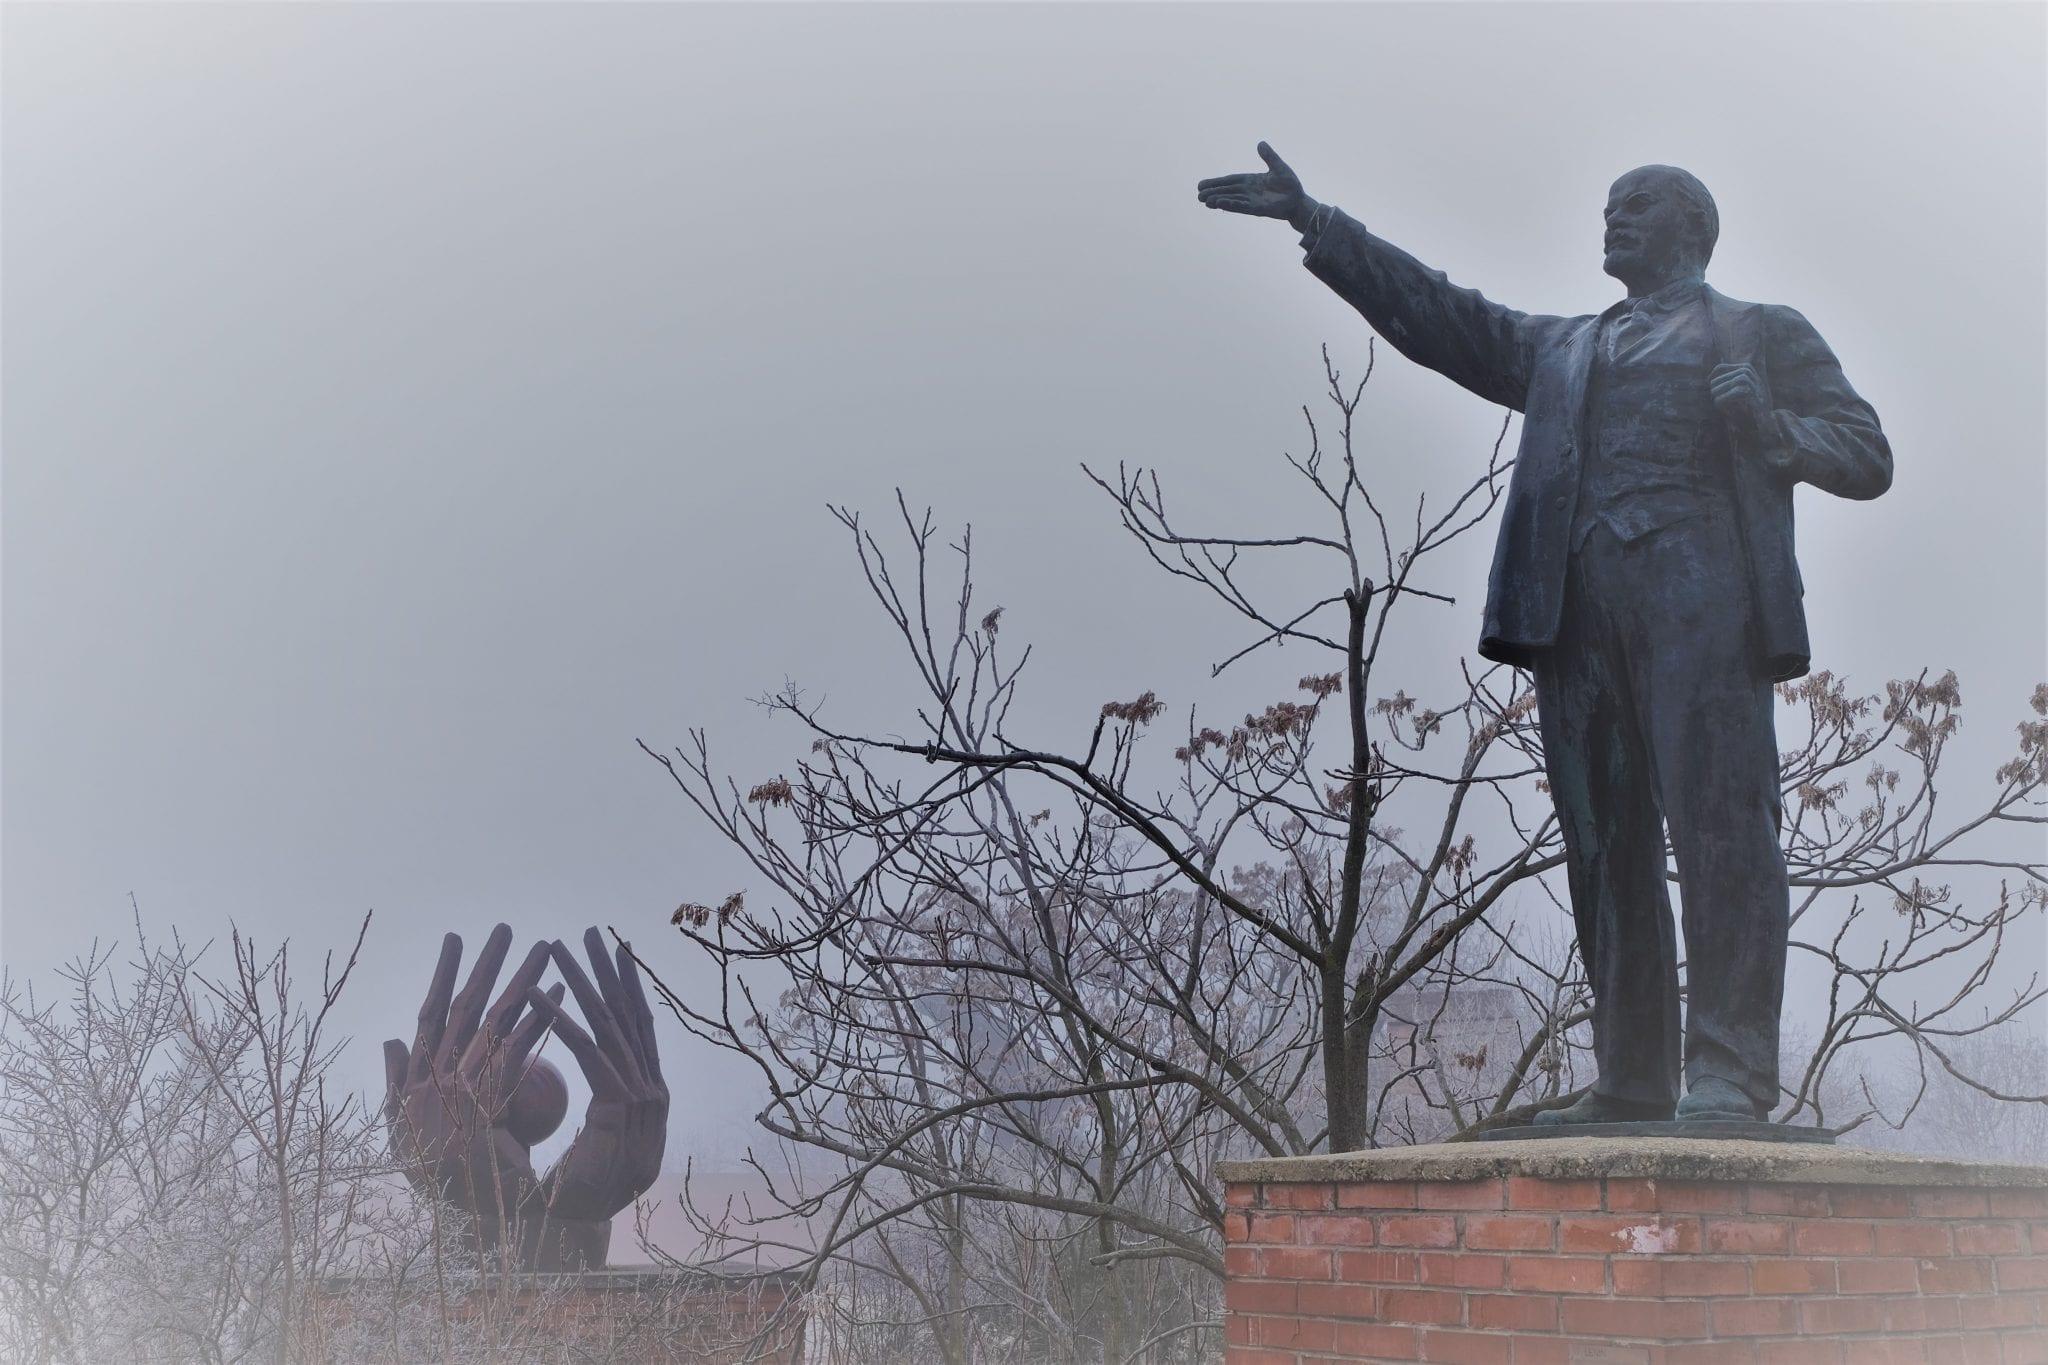 stalin statue in memento park